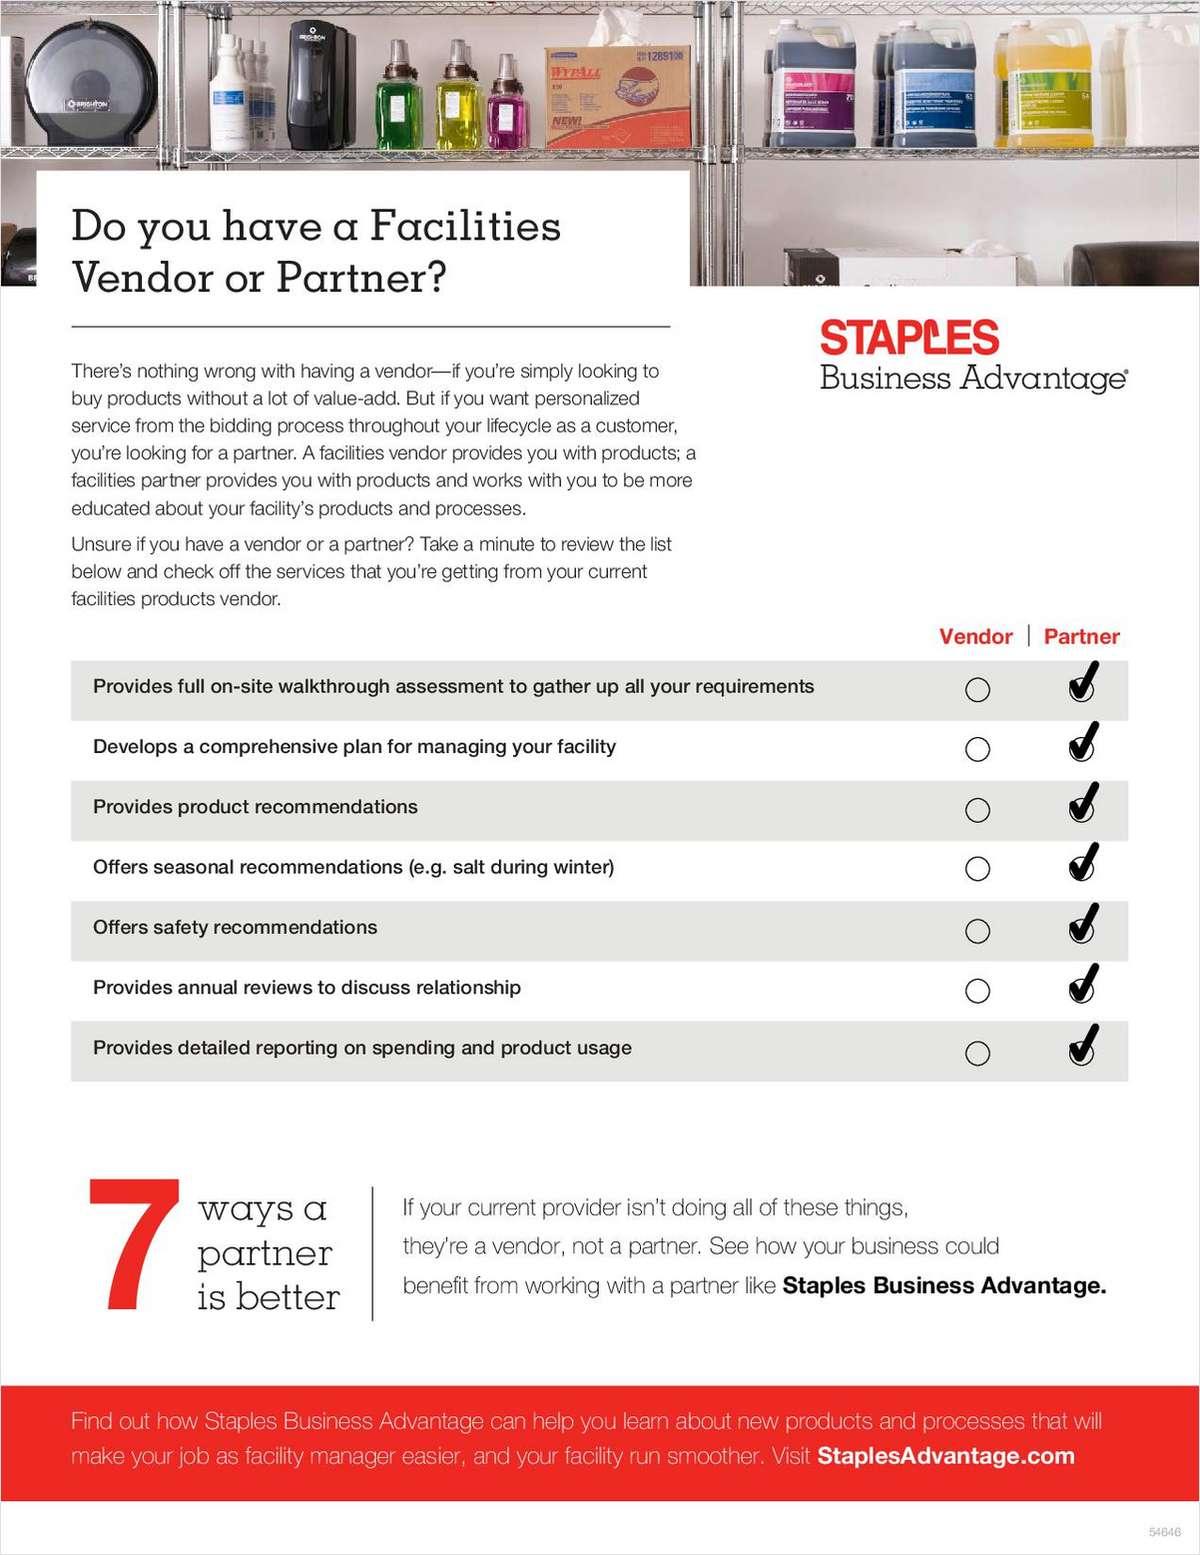 Do You Have a Facilities Vendor or Partner?